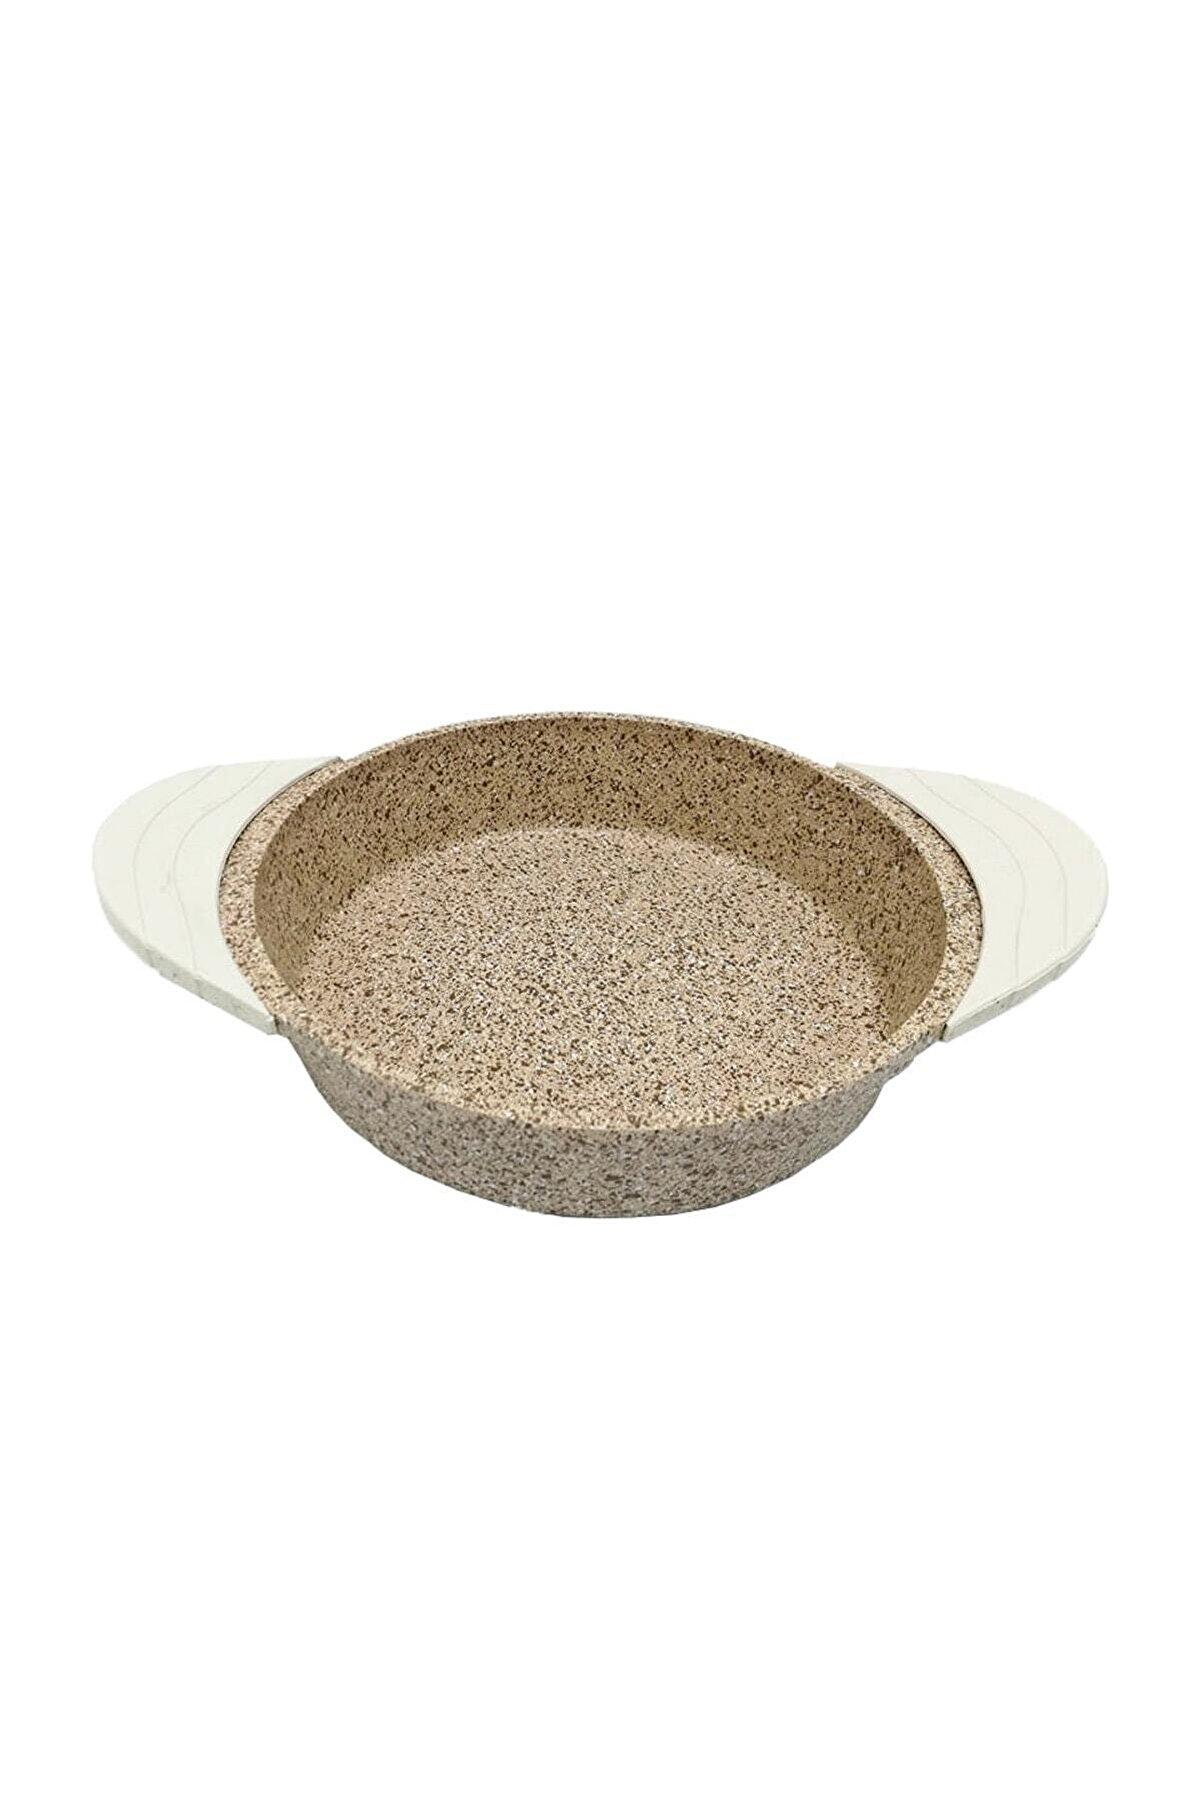 Falez Doacast Creamy 22 Cm Döküm Granit Sahan Tava